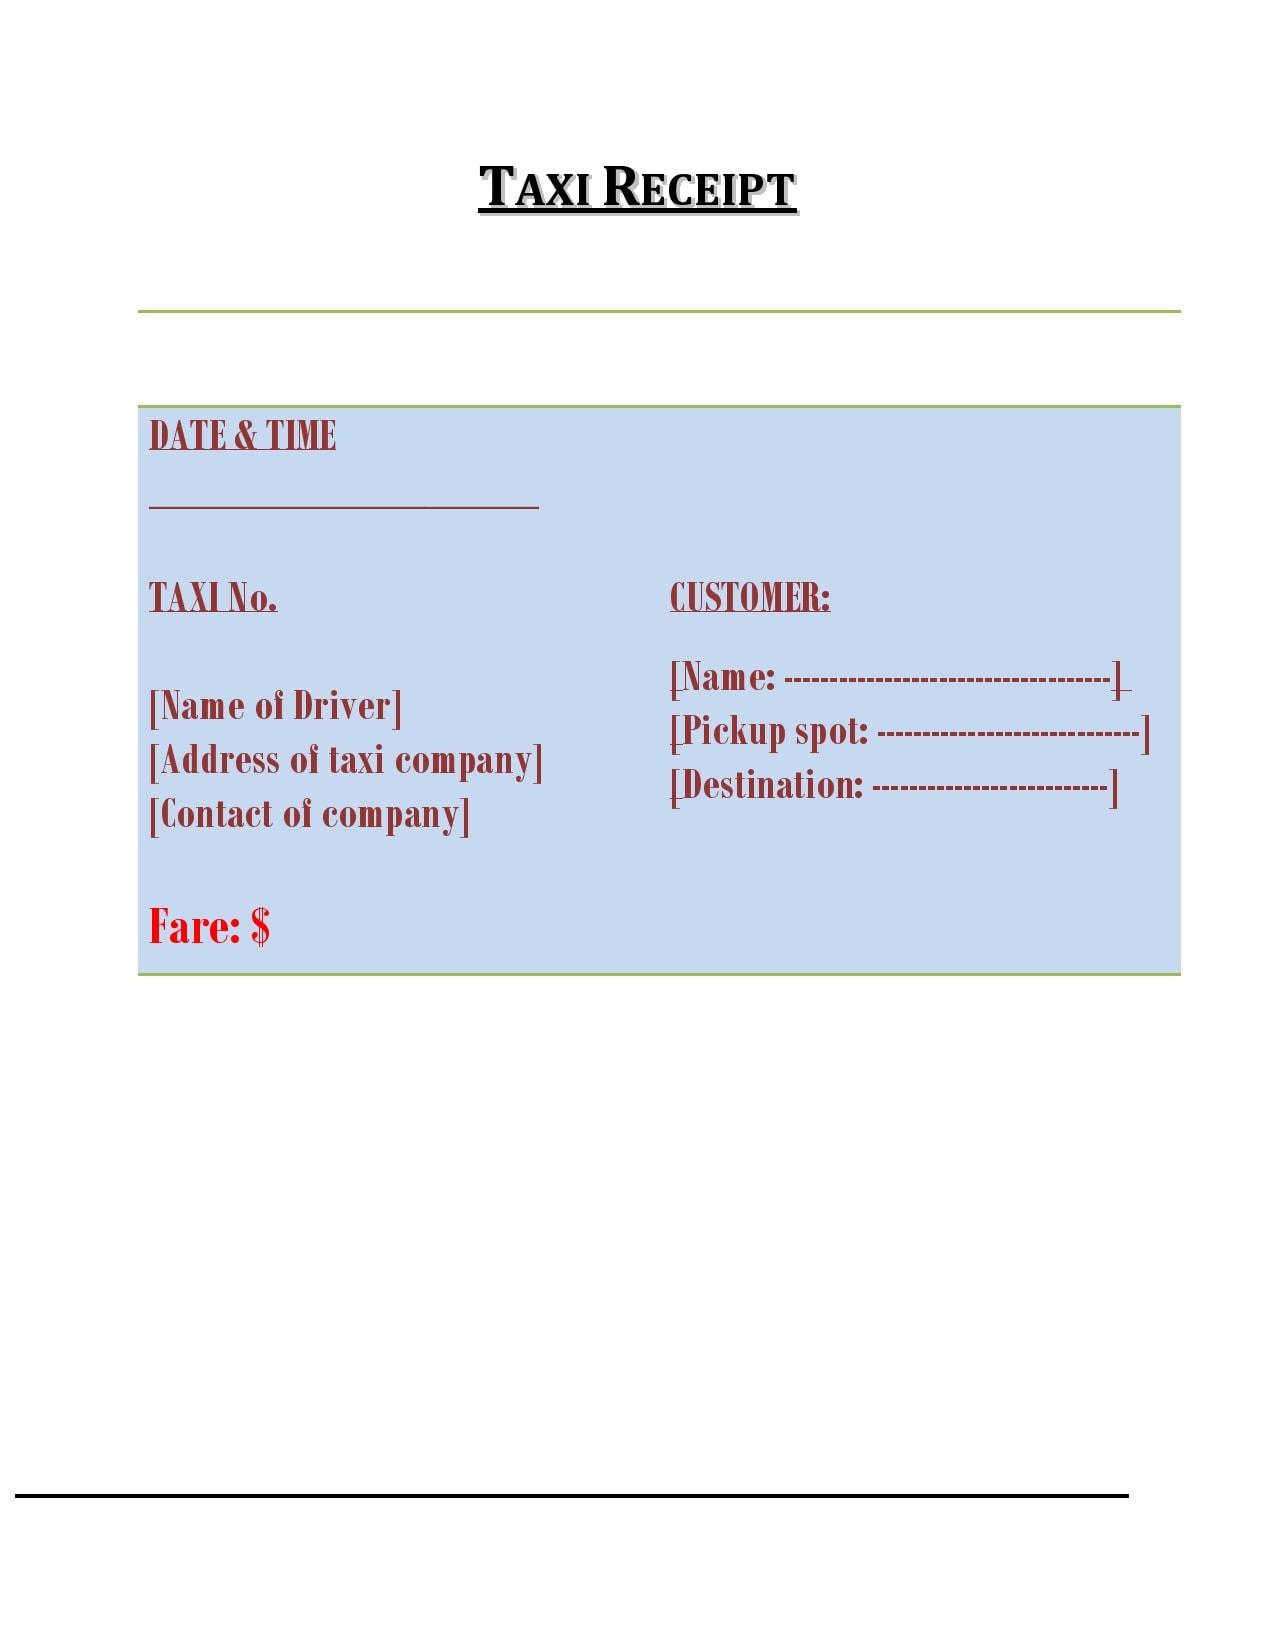 taxi receipt 29